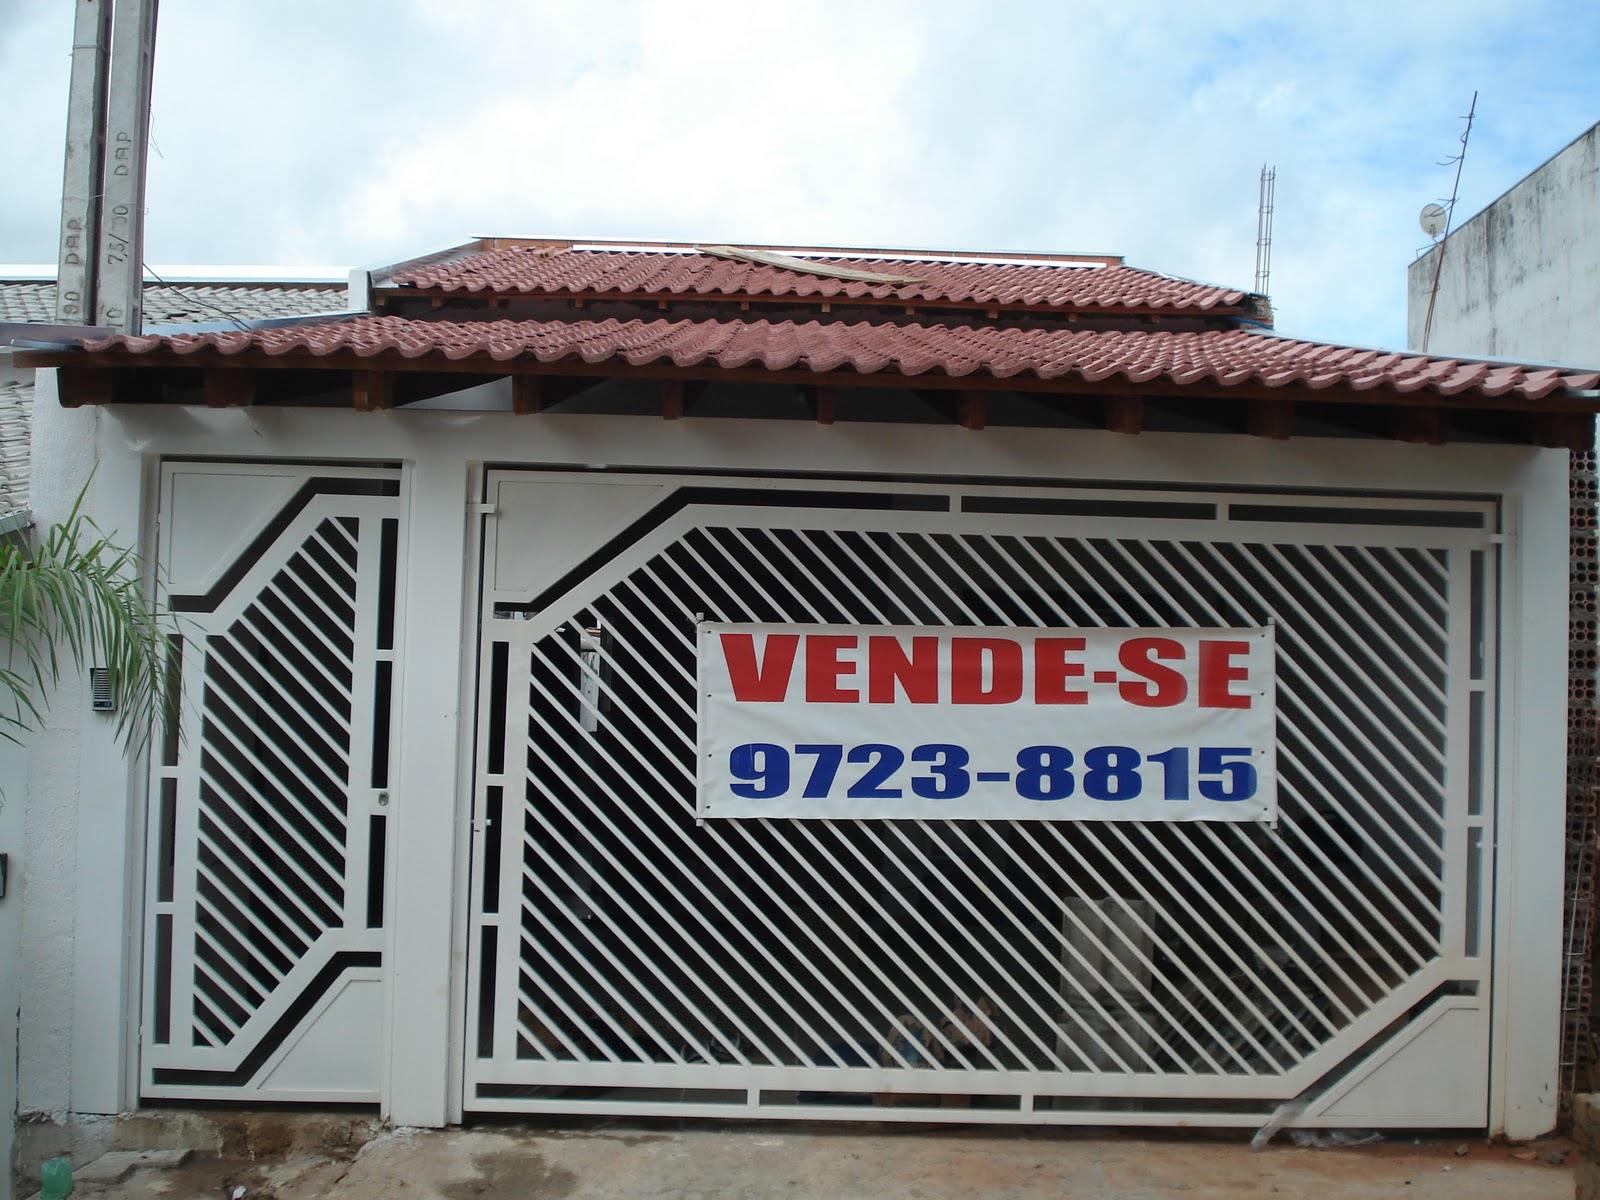 Imagens de #1F316A Rua coroados 945 bairro alto cafezal SP Marilia 1600x1200 px 2806 Box Banheiro Marilia